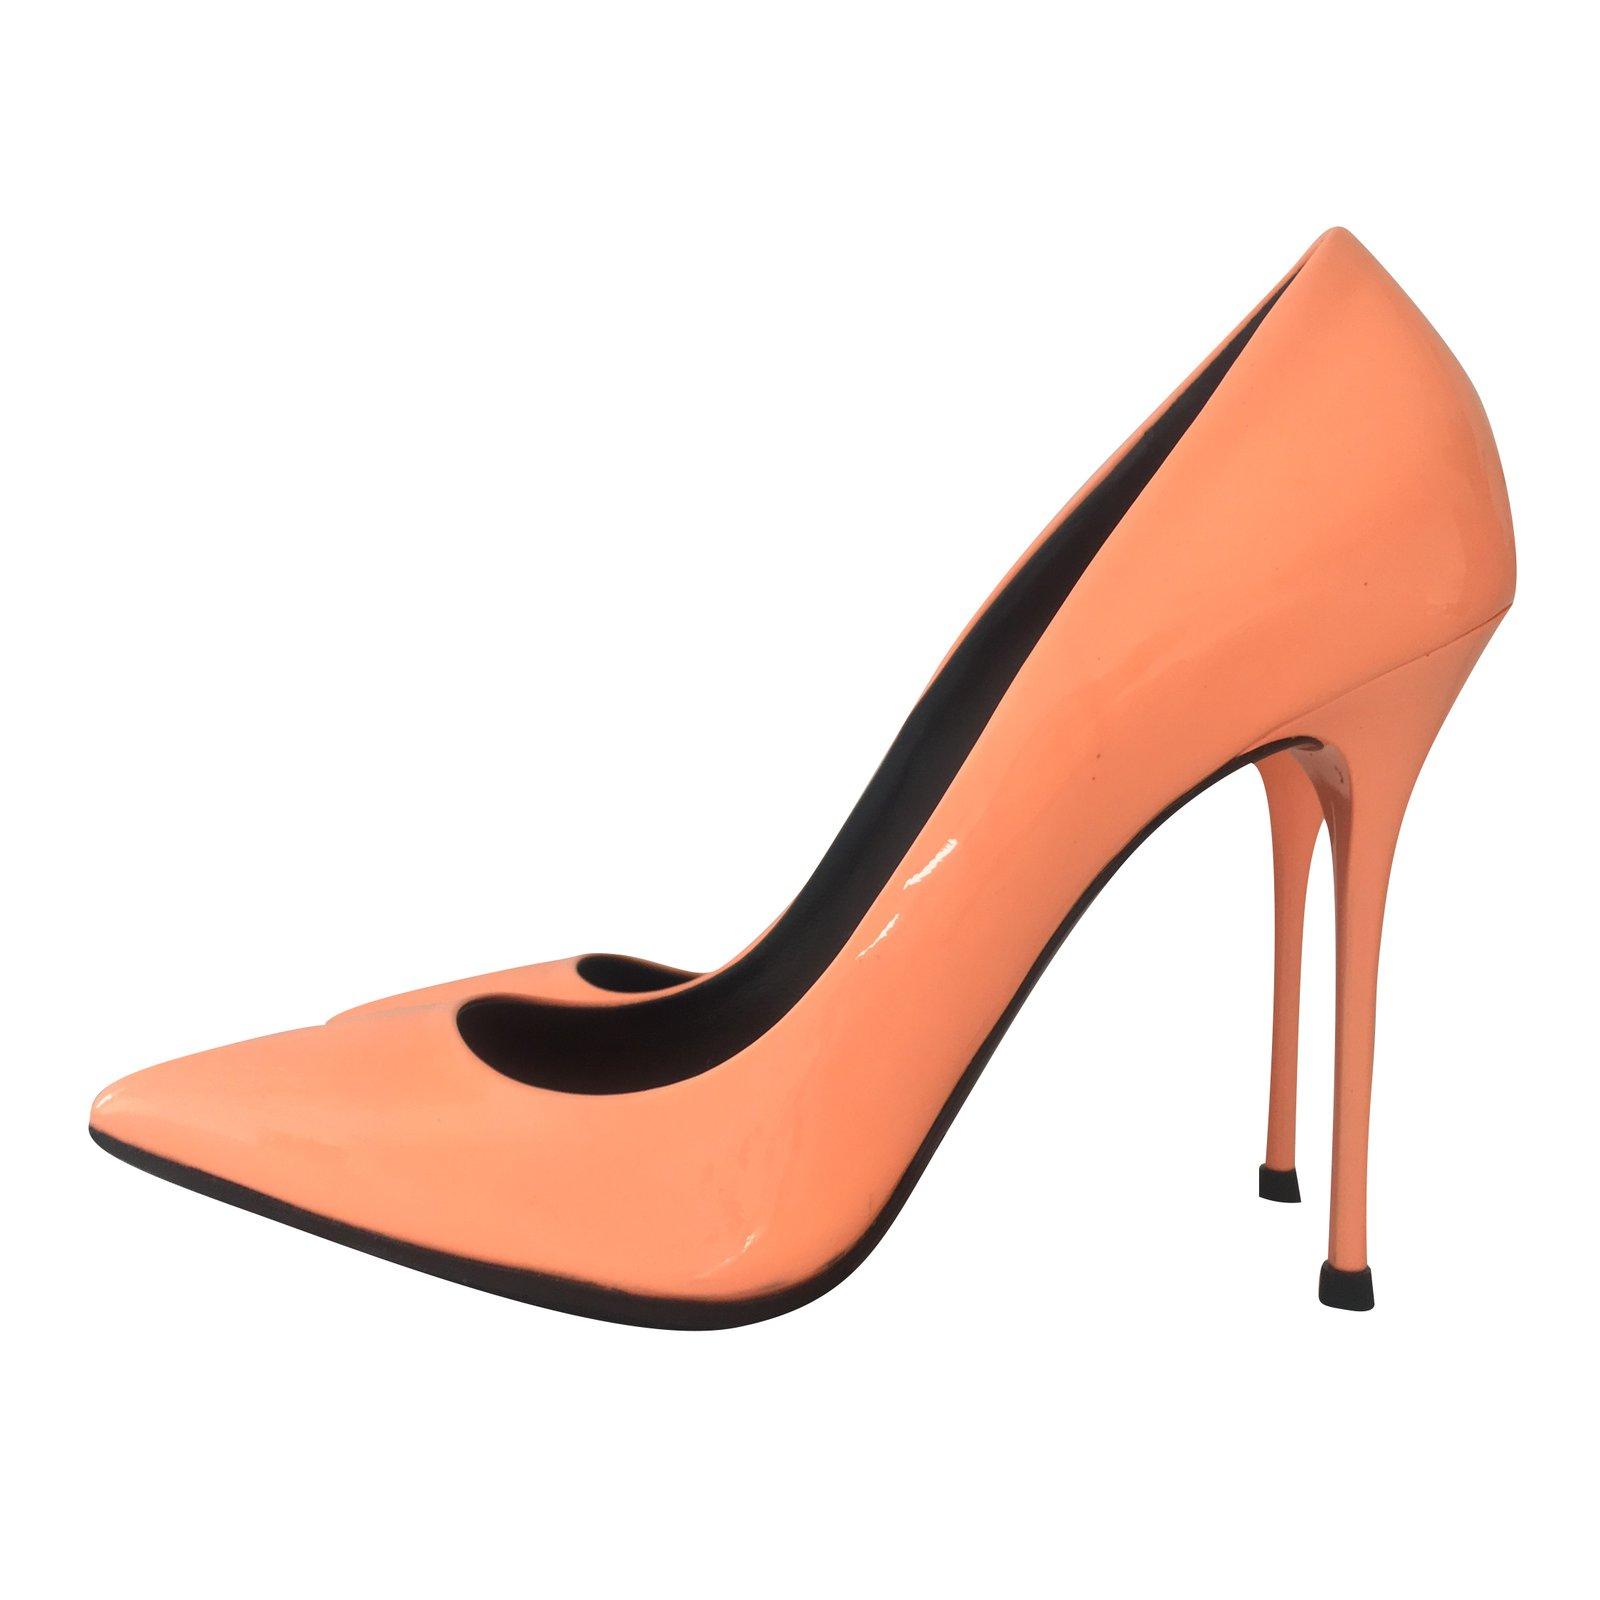 GIANMARCO LORENZI Patent Leather Heels L3udaMZ